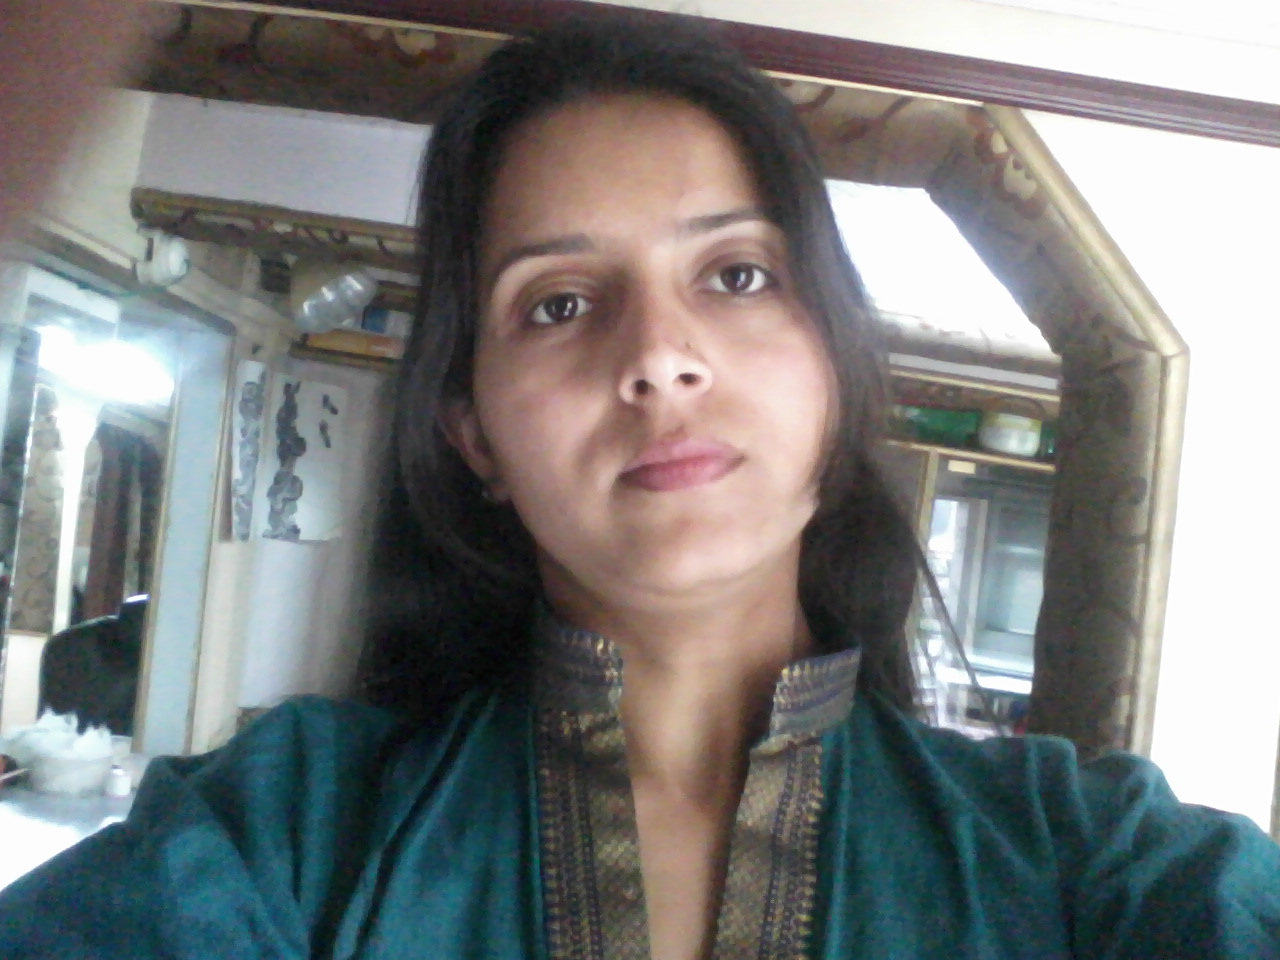 hindu single women in bays Singles meetups in san jose  bay area indian divorced singles we're 532 members  women 40+ single or newly single palo alto to redwood city.